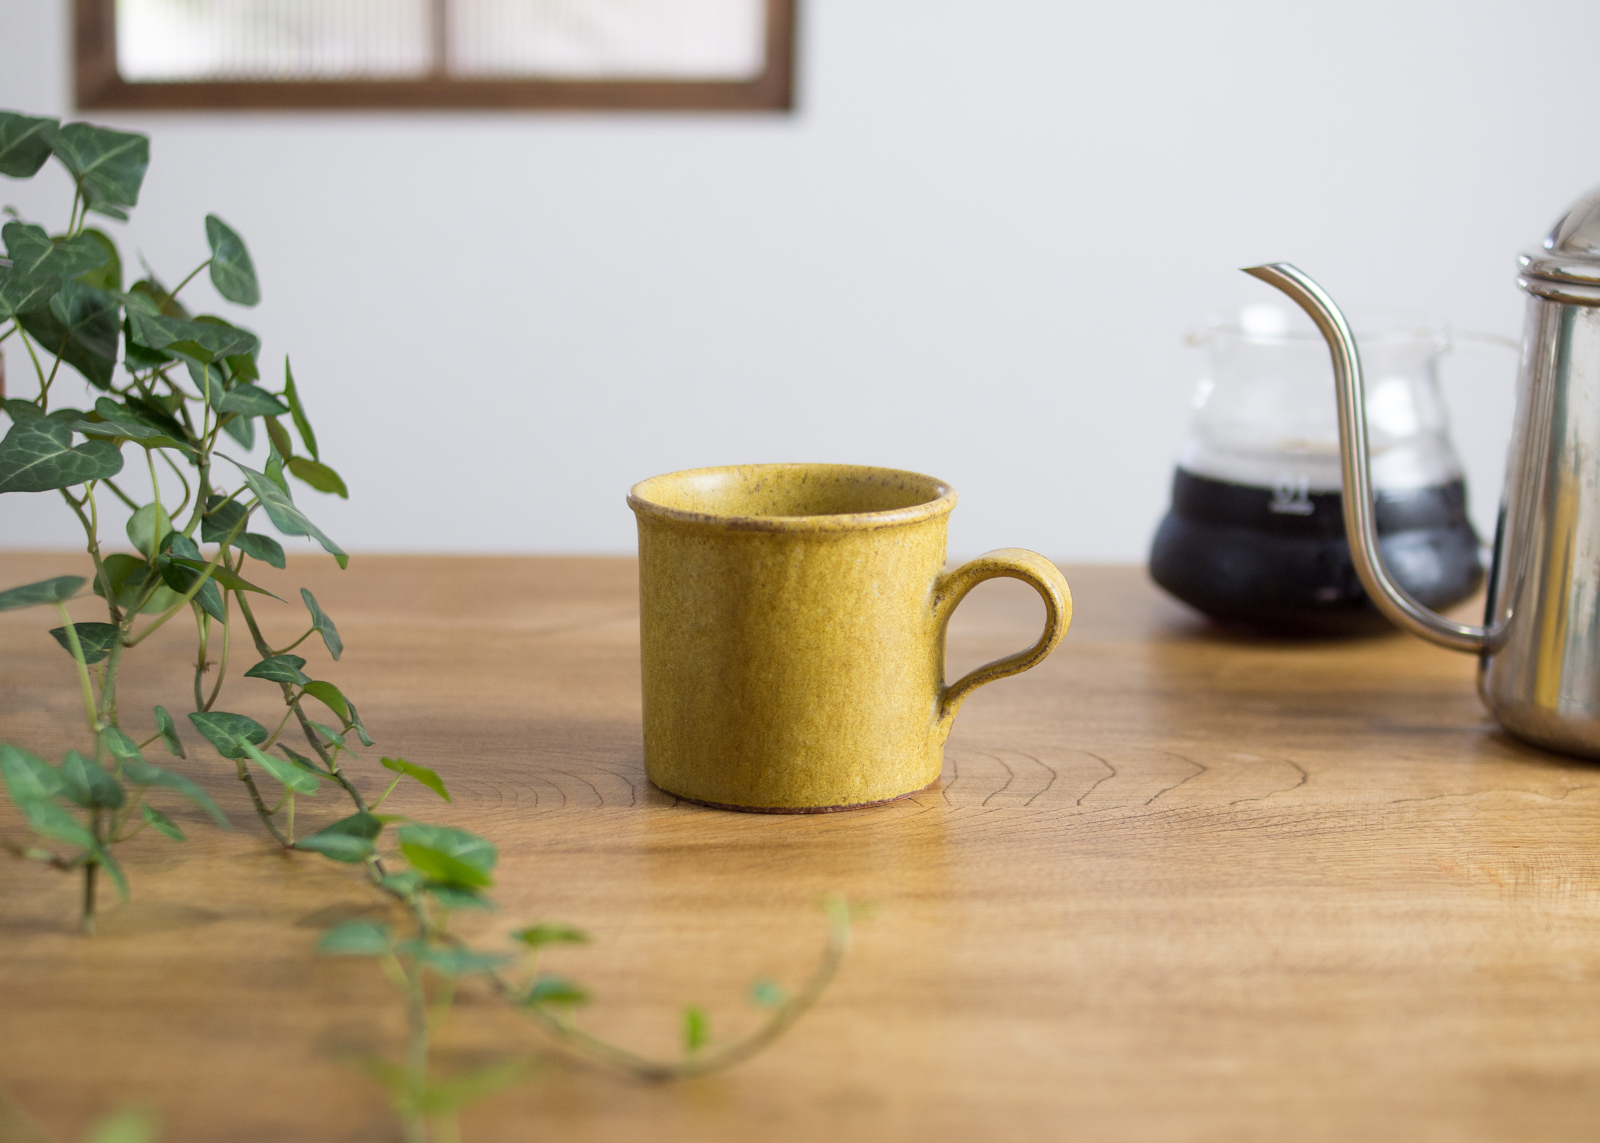 SHIROUMA コーヒーカップ 芥子色(マグカップ)/長谷川 哲也